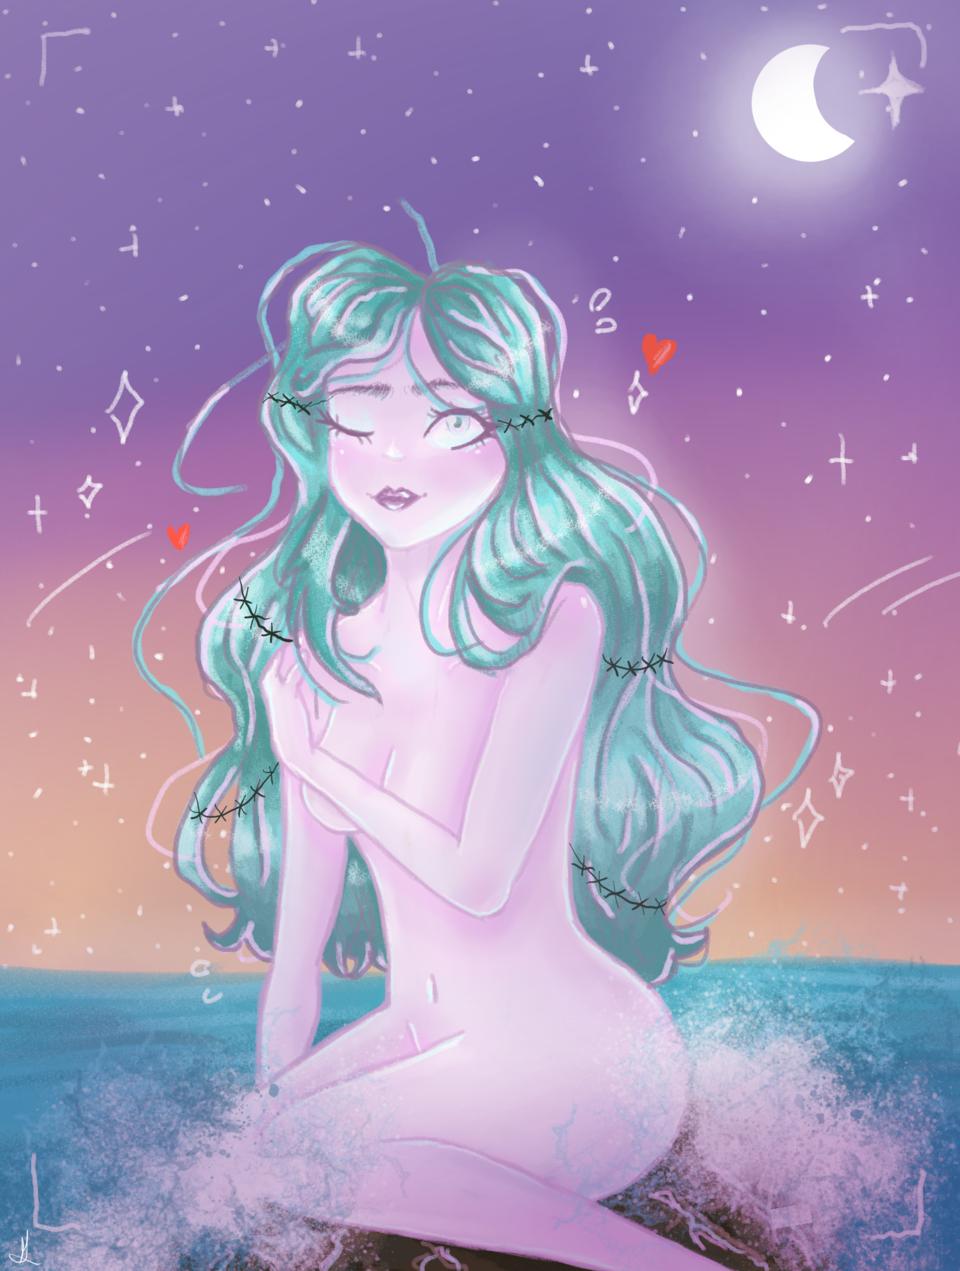 xhica en el oceano Illust of flolight2020 chicas Oceano